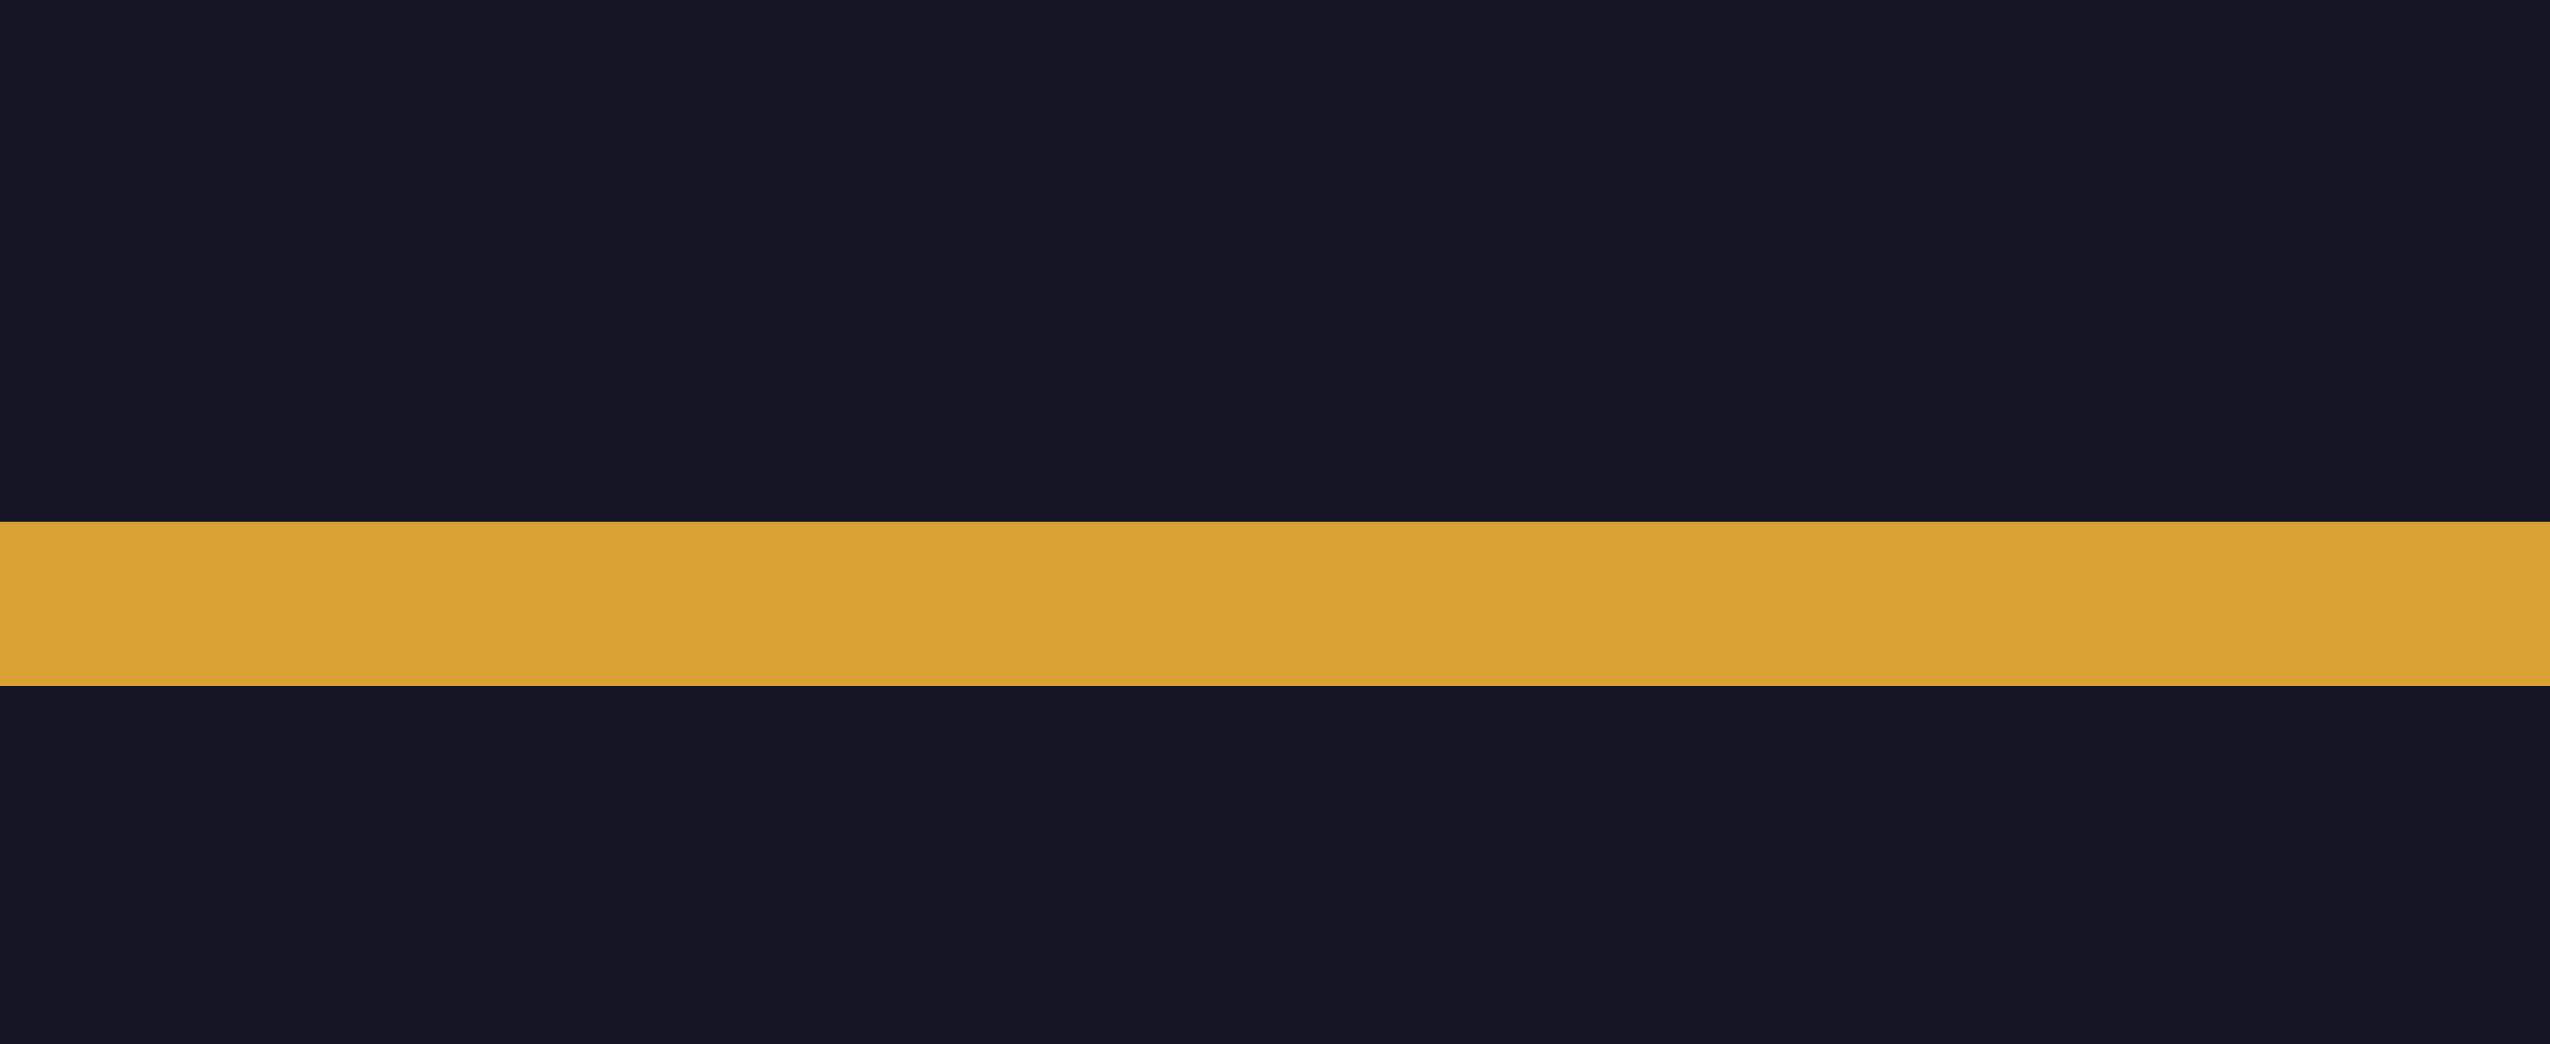 Navy_Galben_Gildan